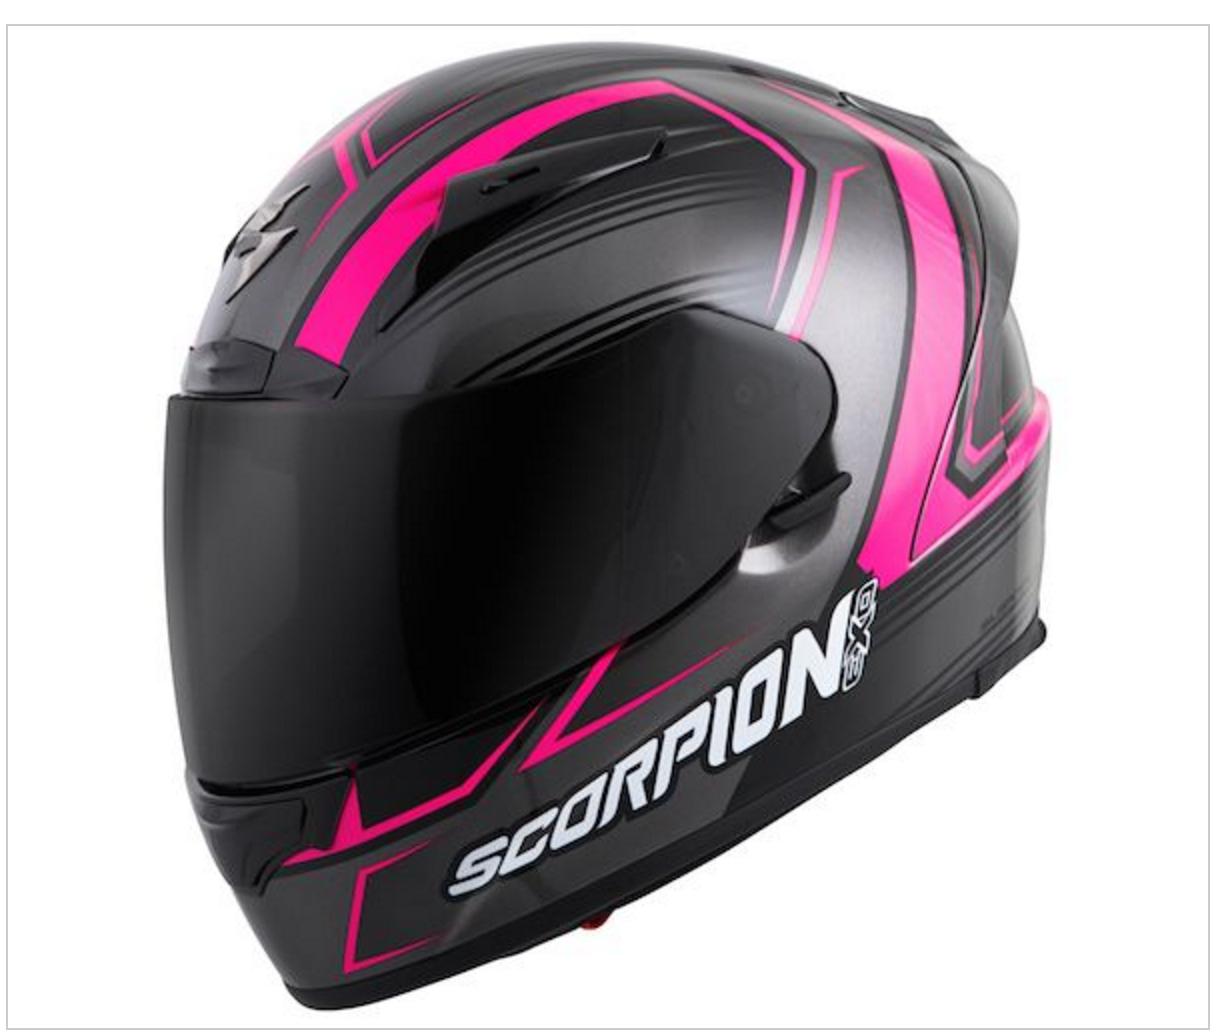 Scorpion Exo R2000 Launch Women's Helmet